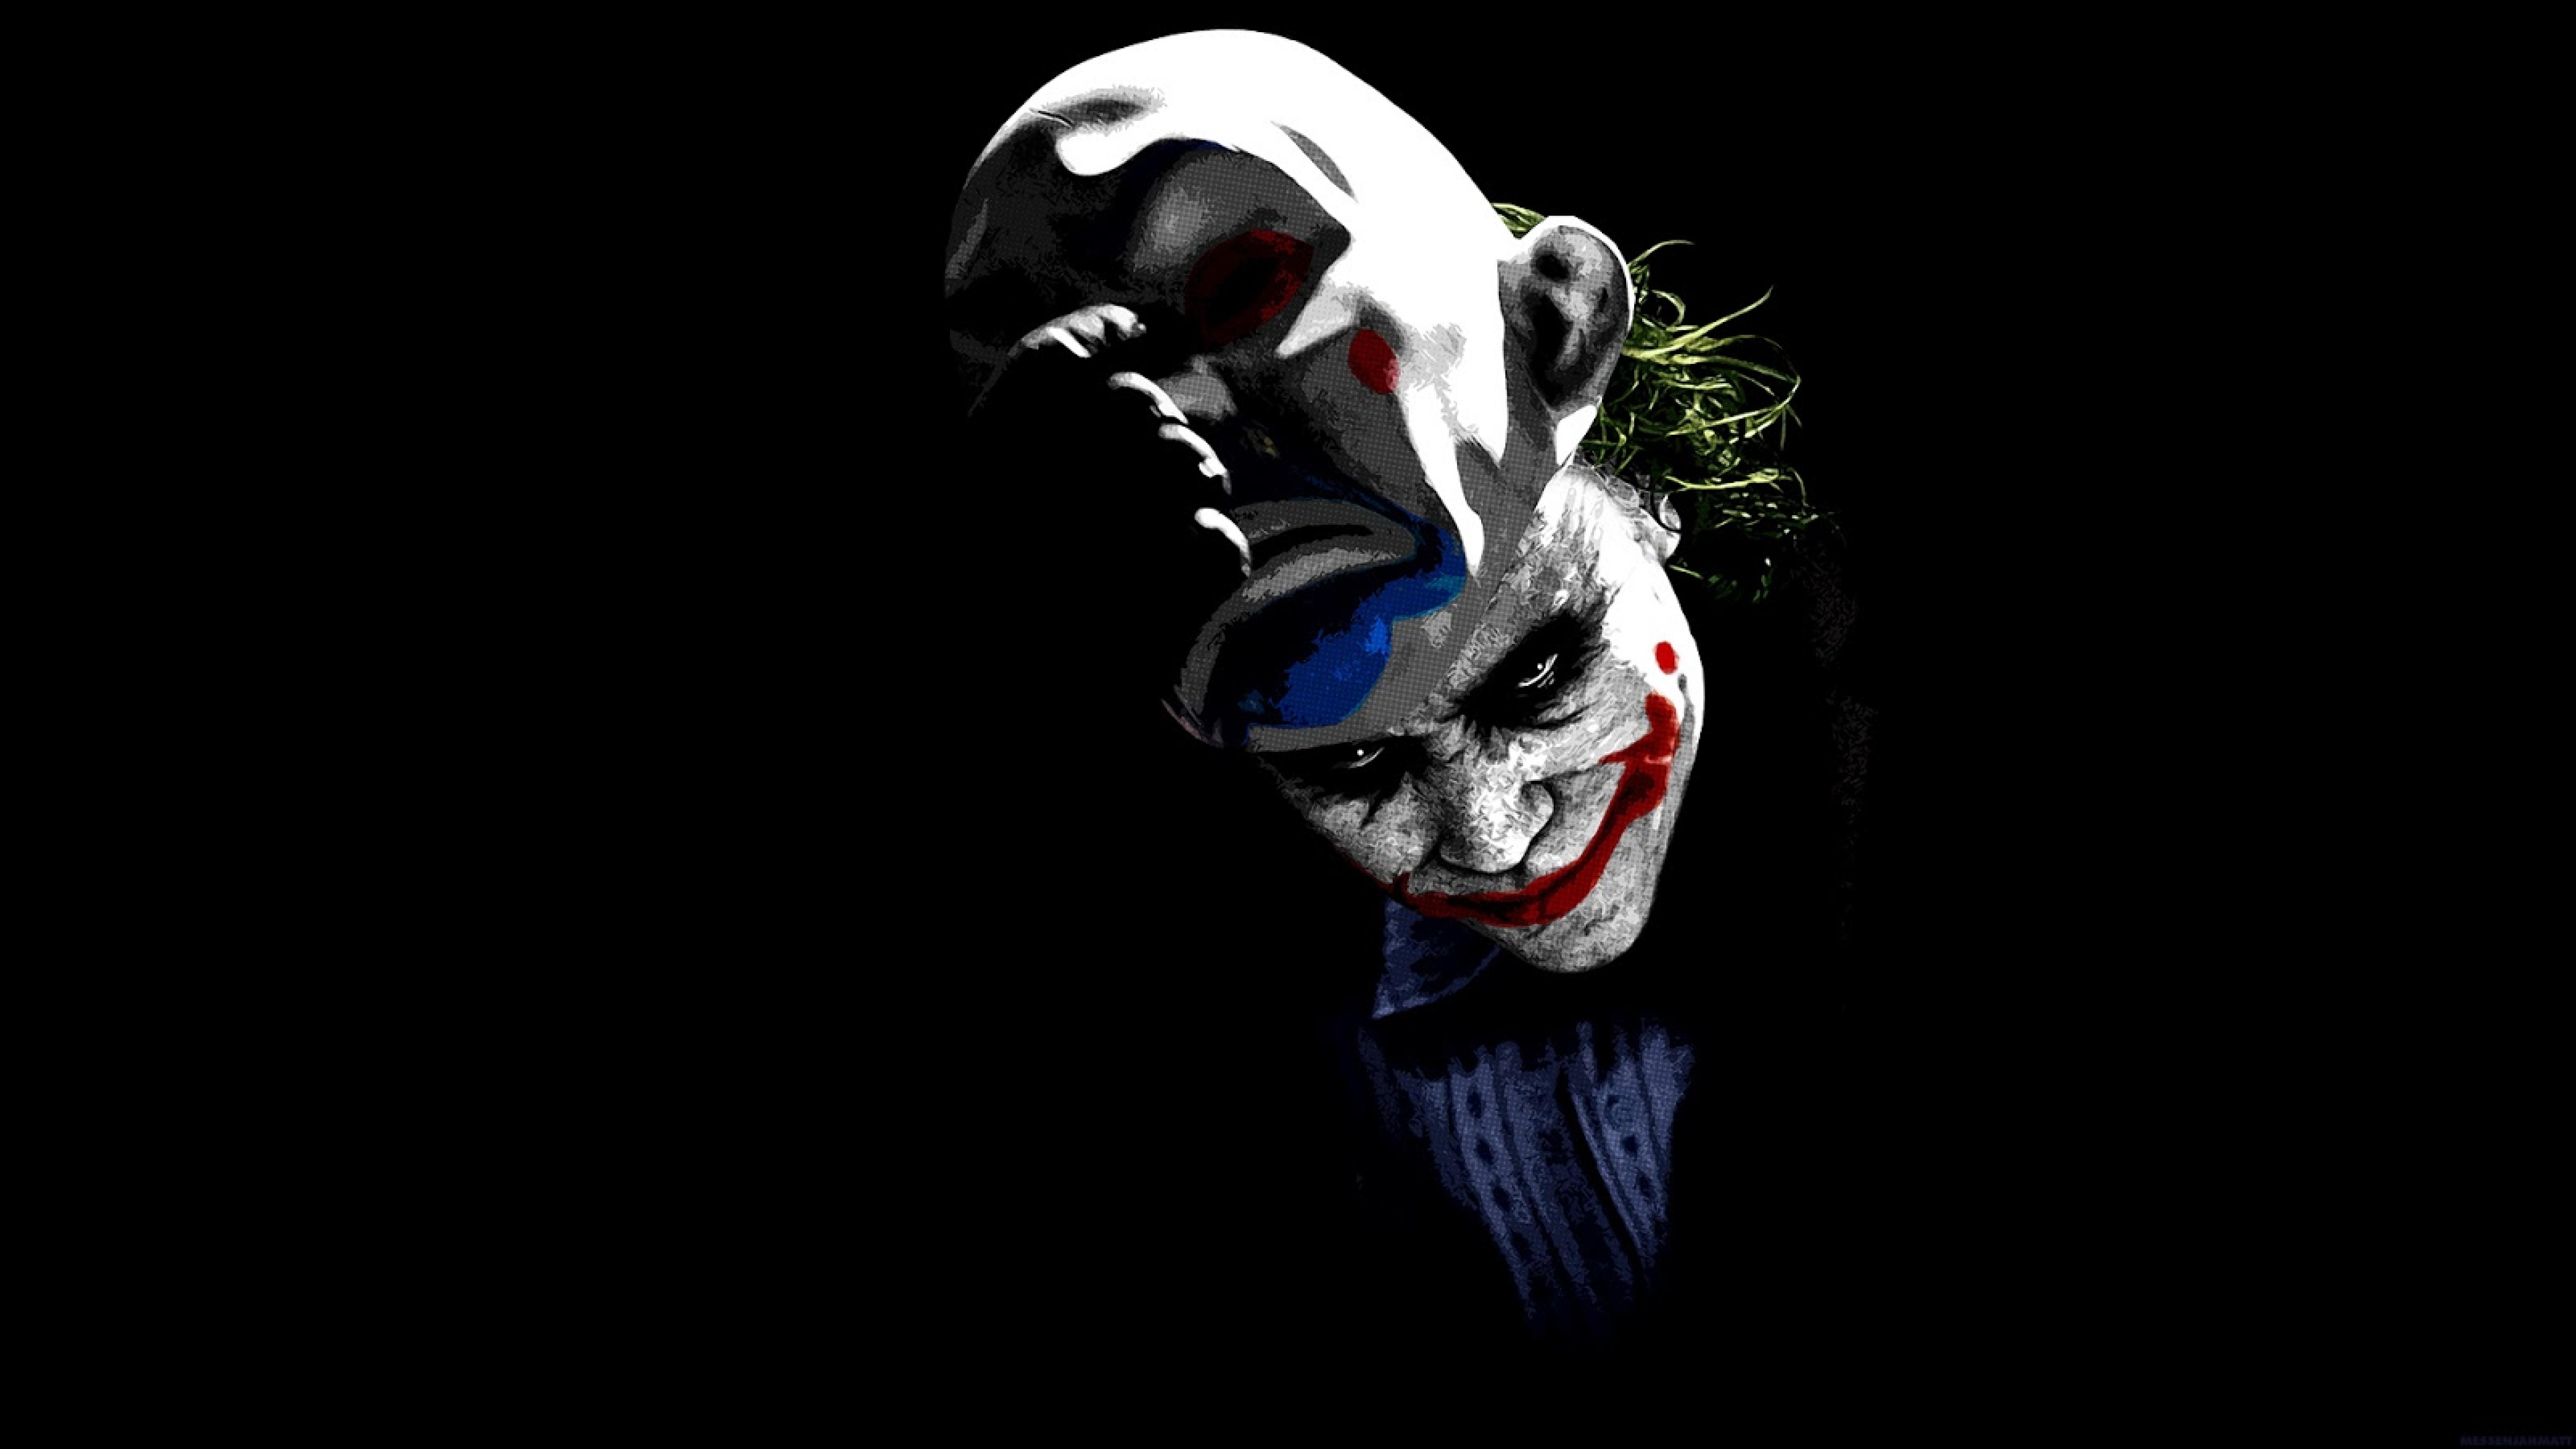 7680x4320 Joker 8K Wallpaper, HD Artist 4K Wallpapers, Images